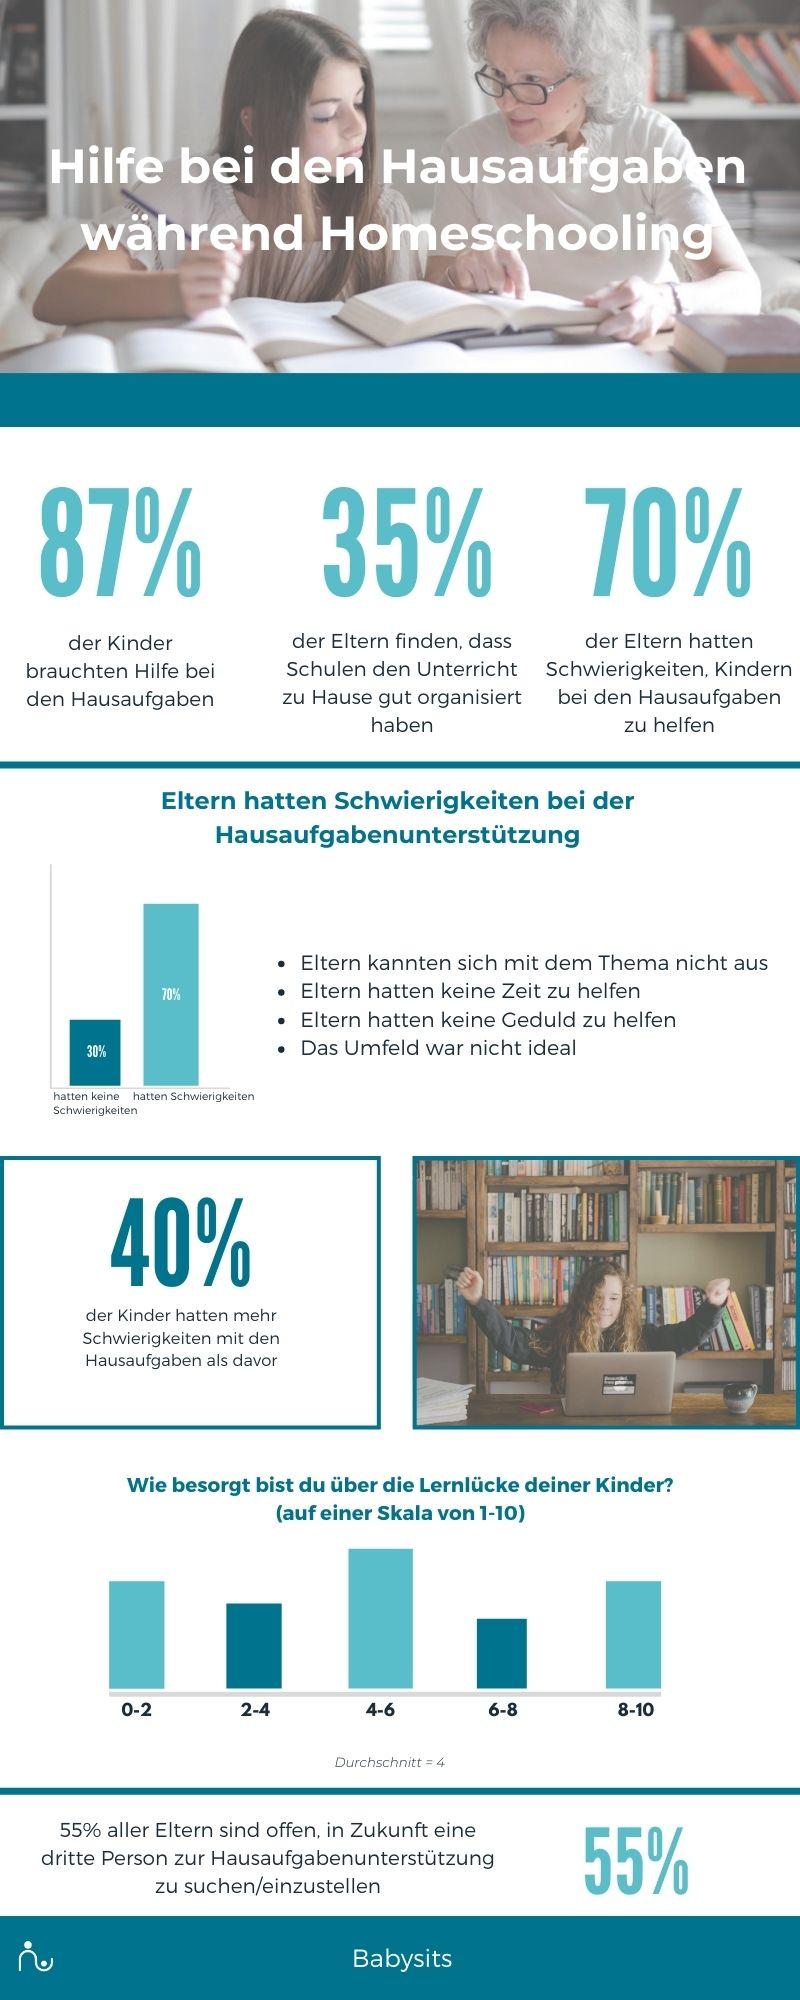 Infografik Hausaufgabenhilfe während Homeschooling